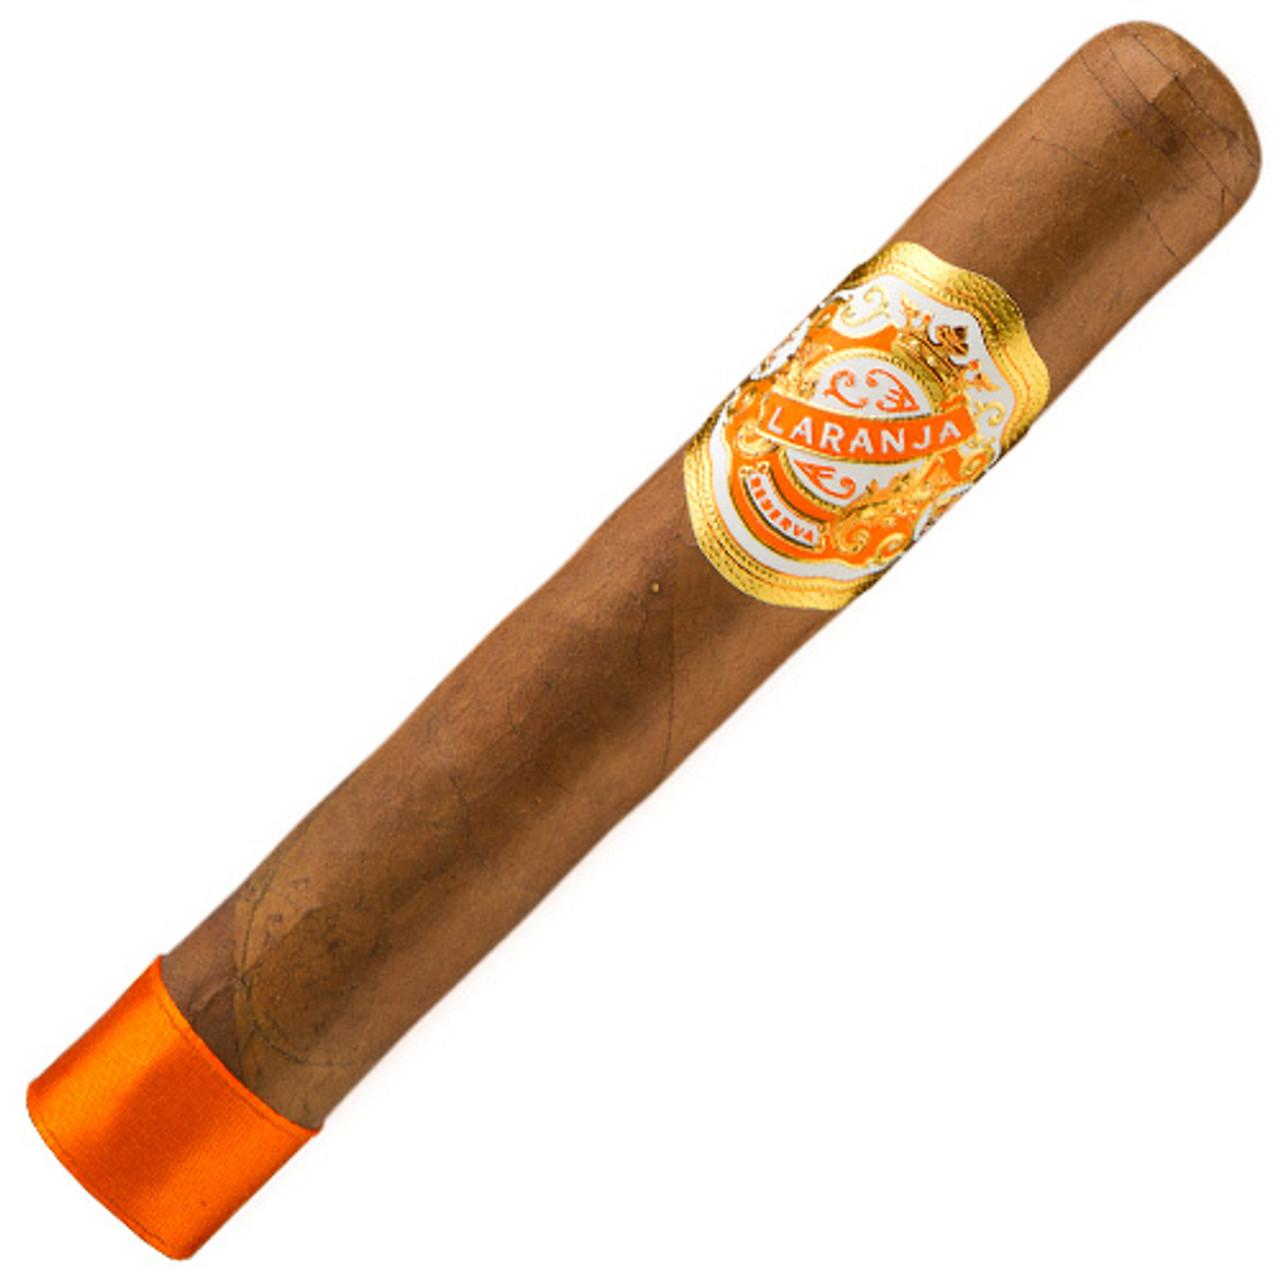 Espinosa Laranja Reserva Robusto Extra Cigars - 5.5 x 54 (Cedar Chest of 20)